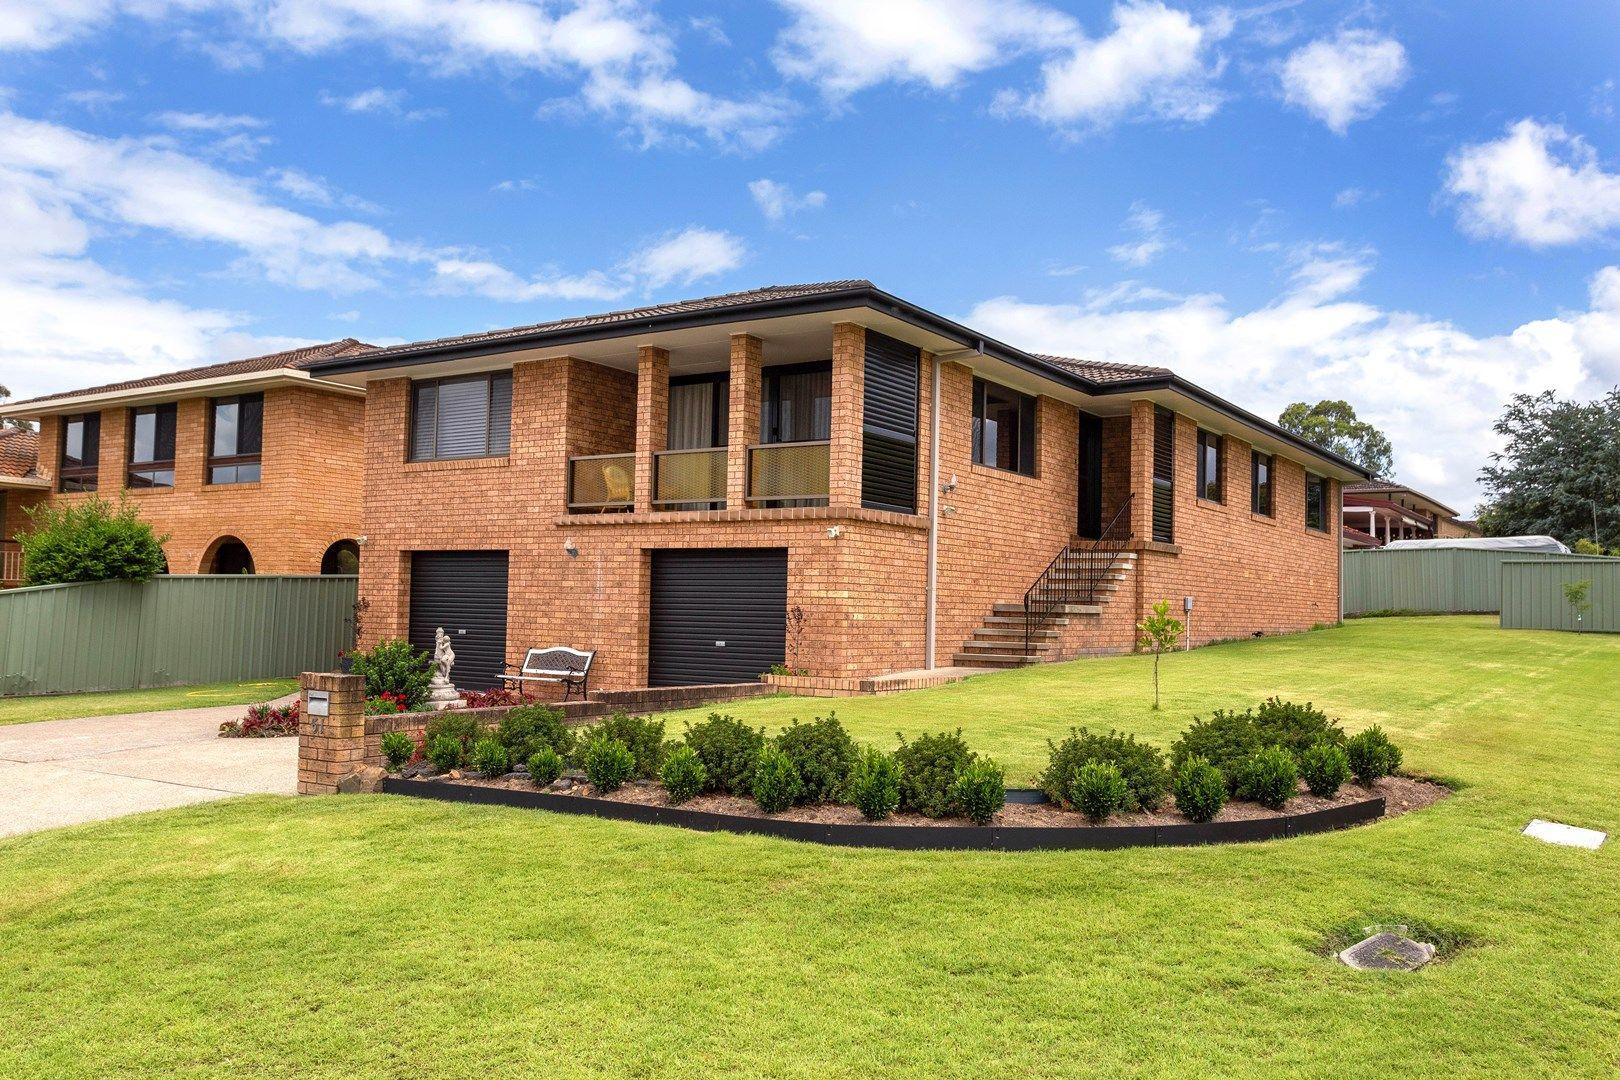 51 Ritchie Crescent, Taree NSW 2430, Image 0